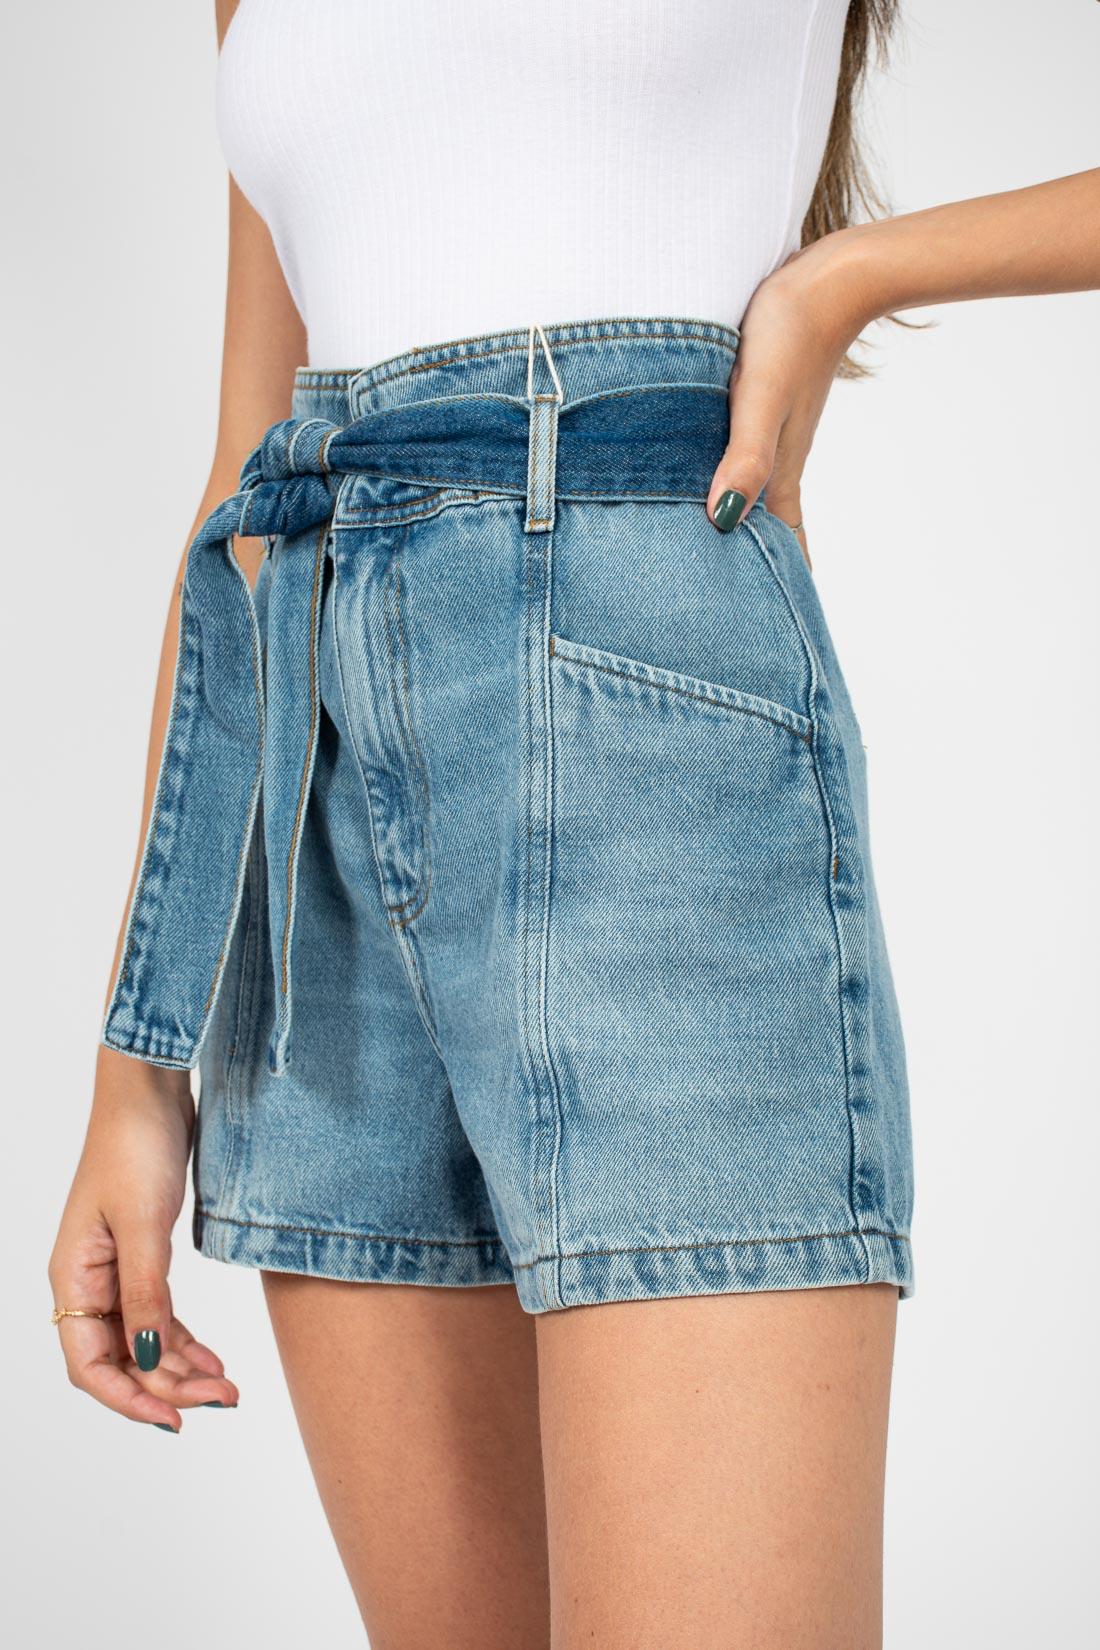 Shorts Jeans Colcci Com Cinto